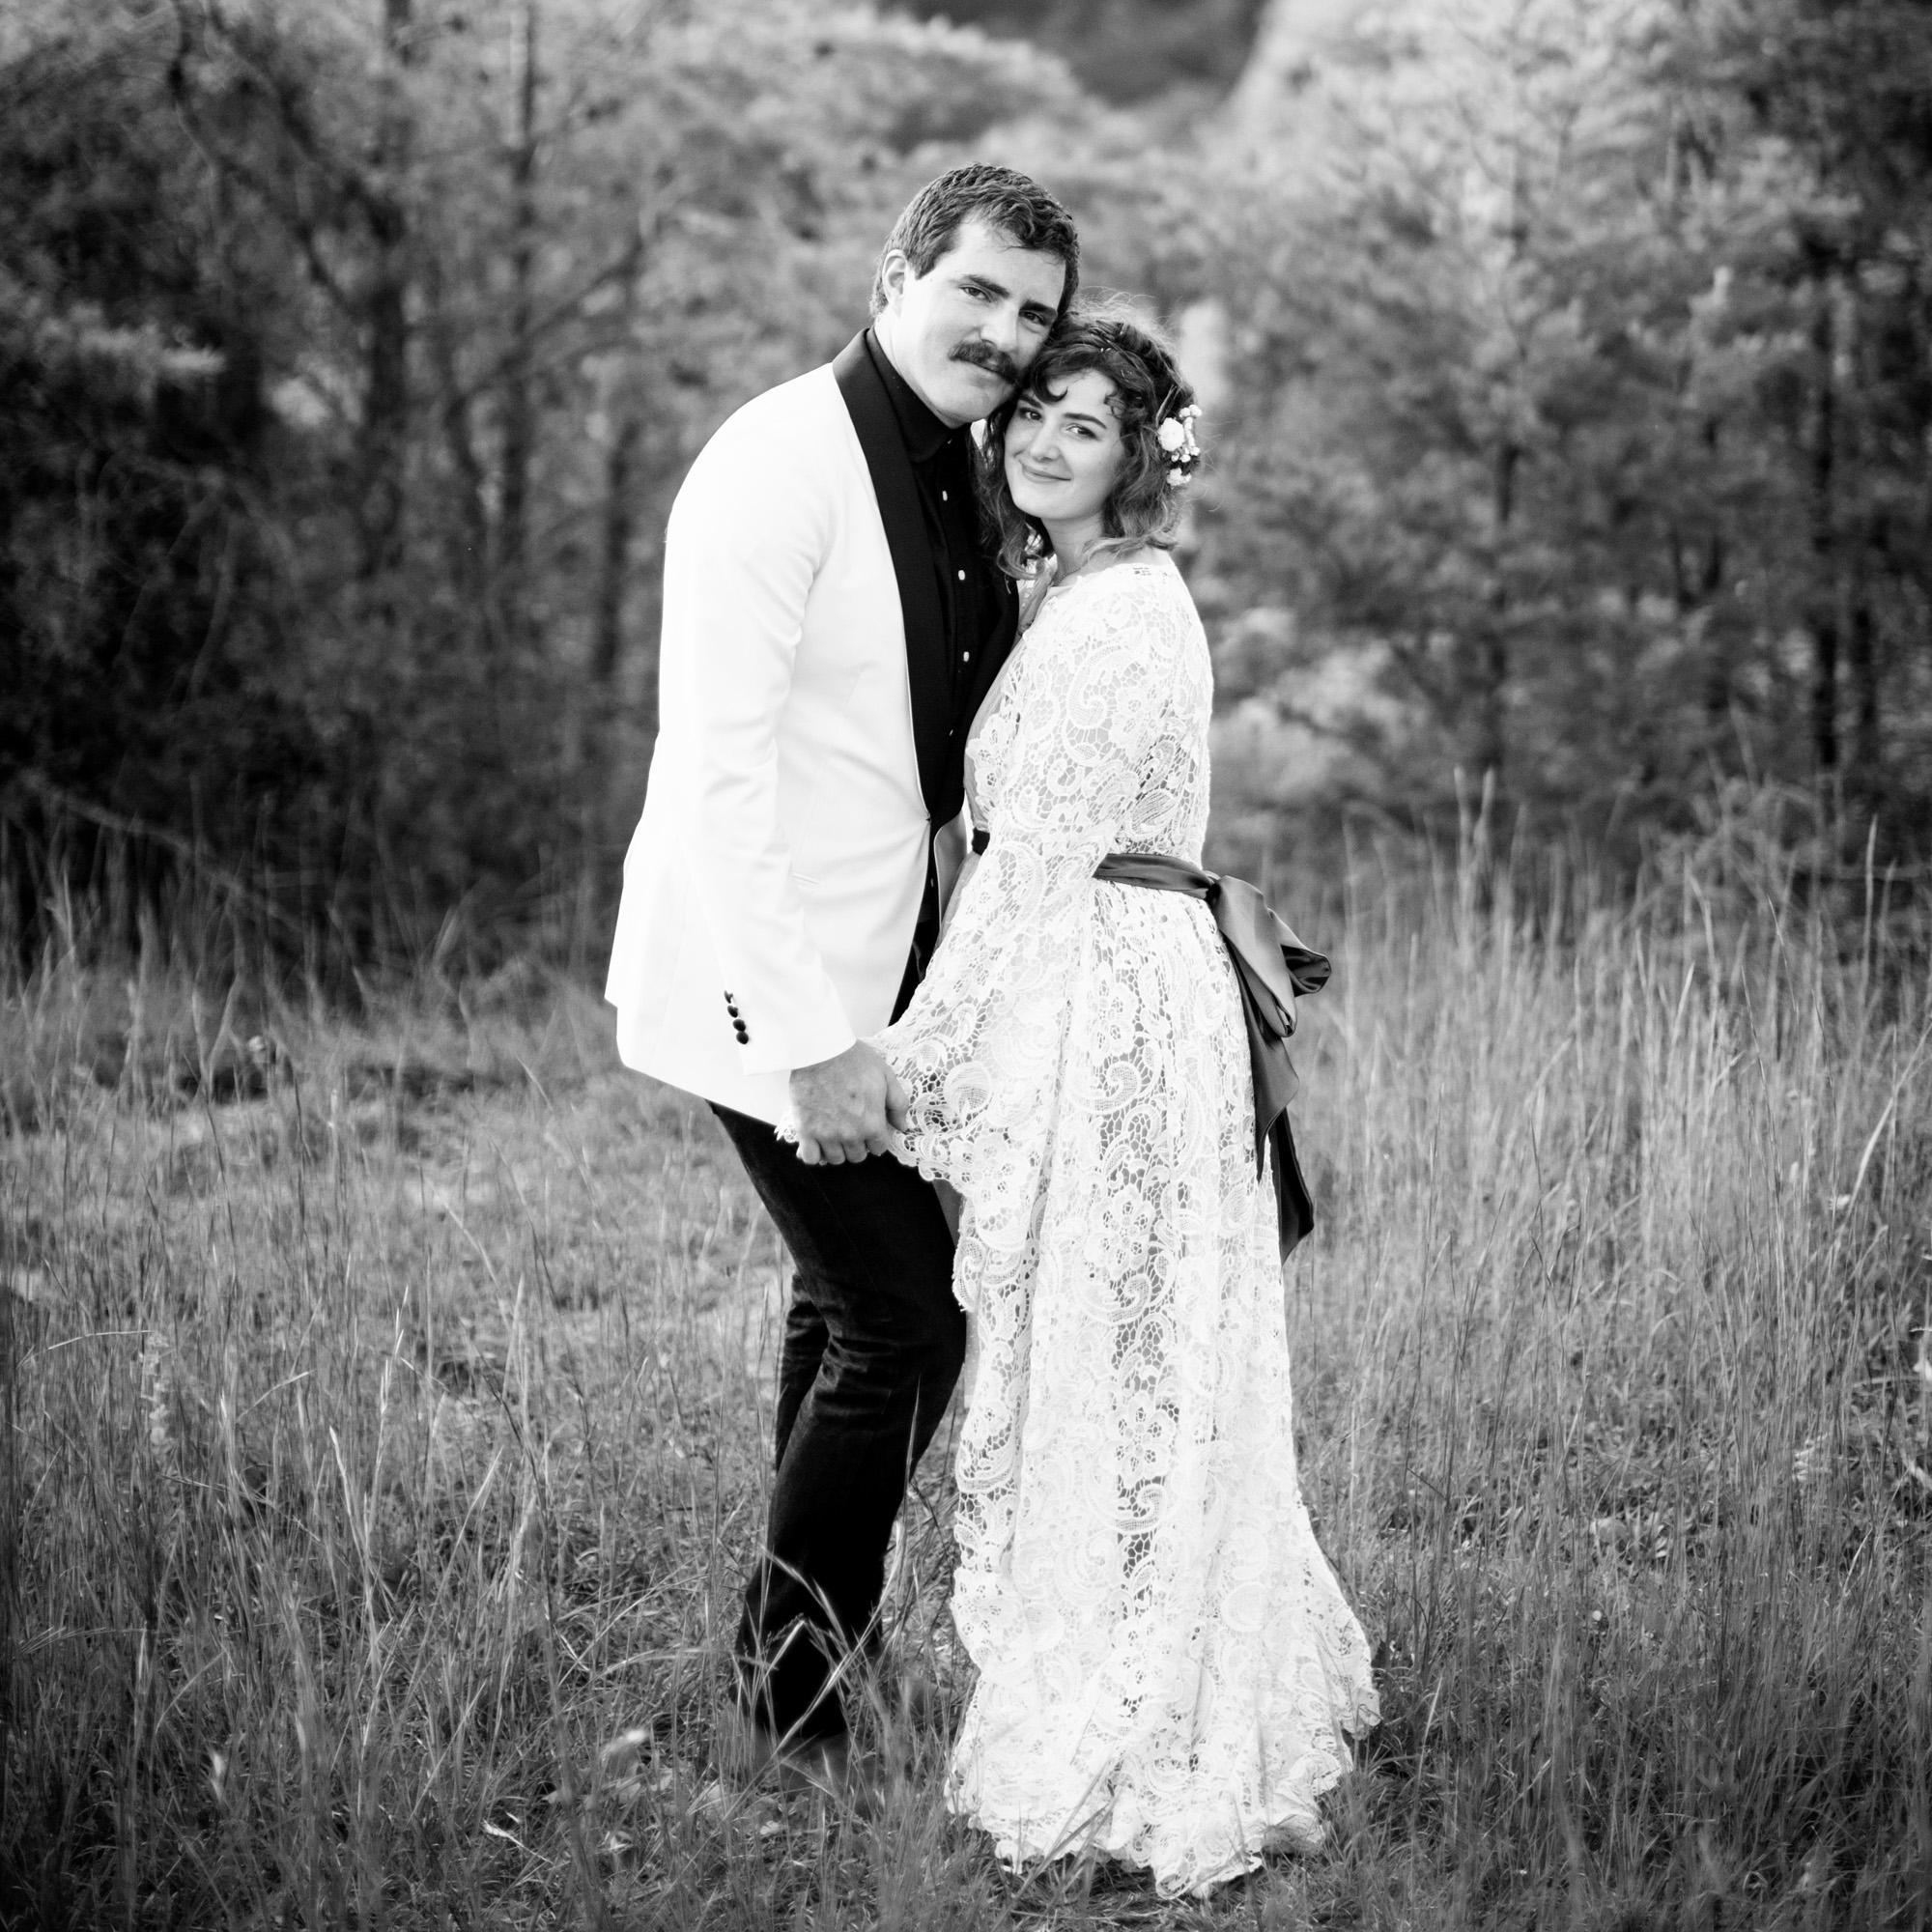 Seriously_Sabrina_Photography_Red_River_Gorge_Kentucky_Wedding_ShawnDana153.jpg